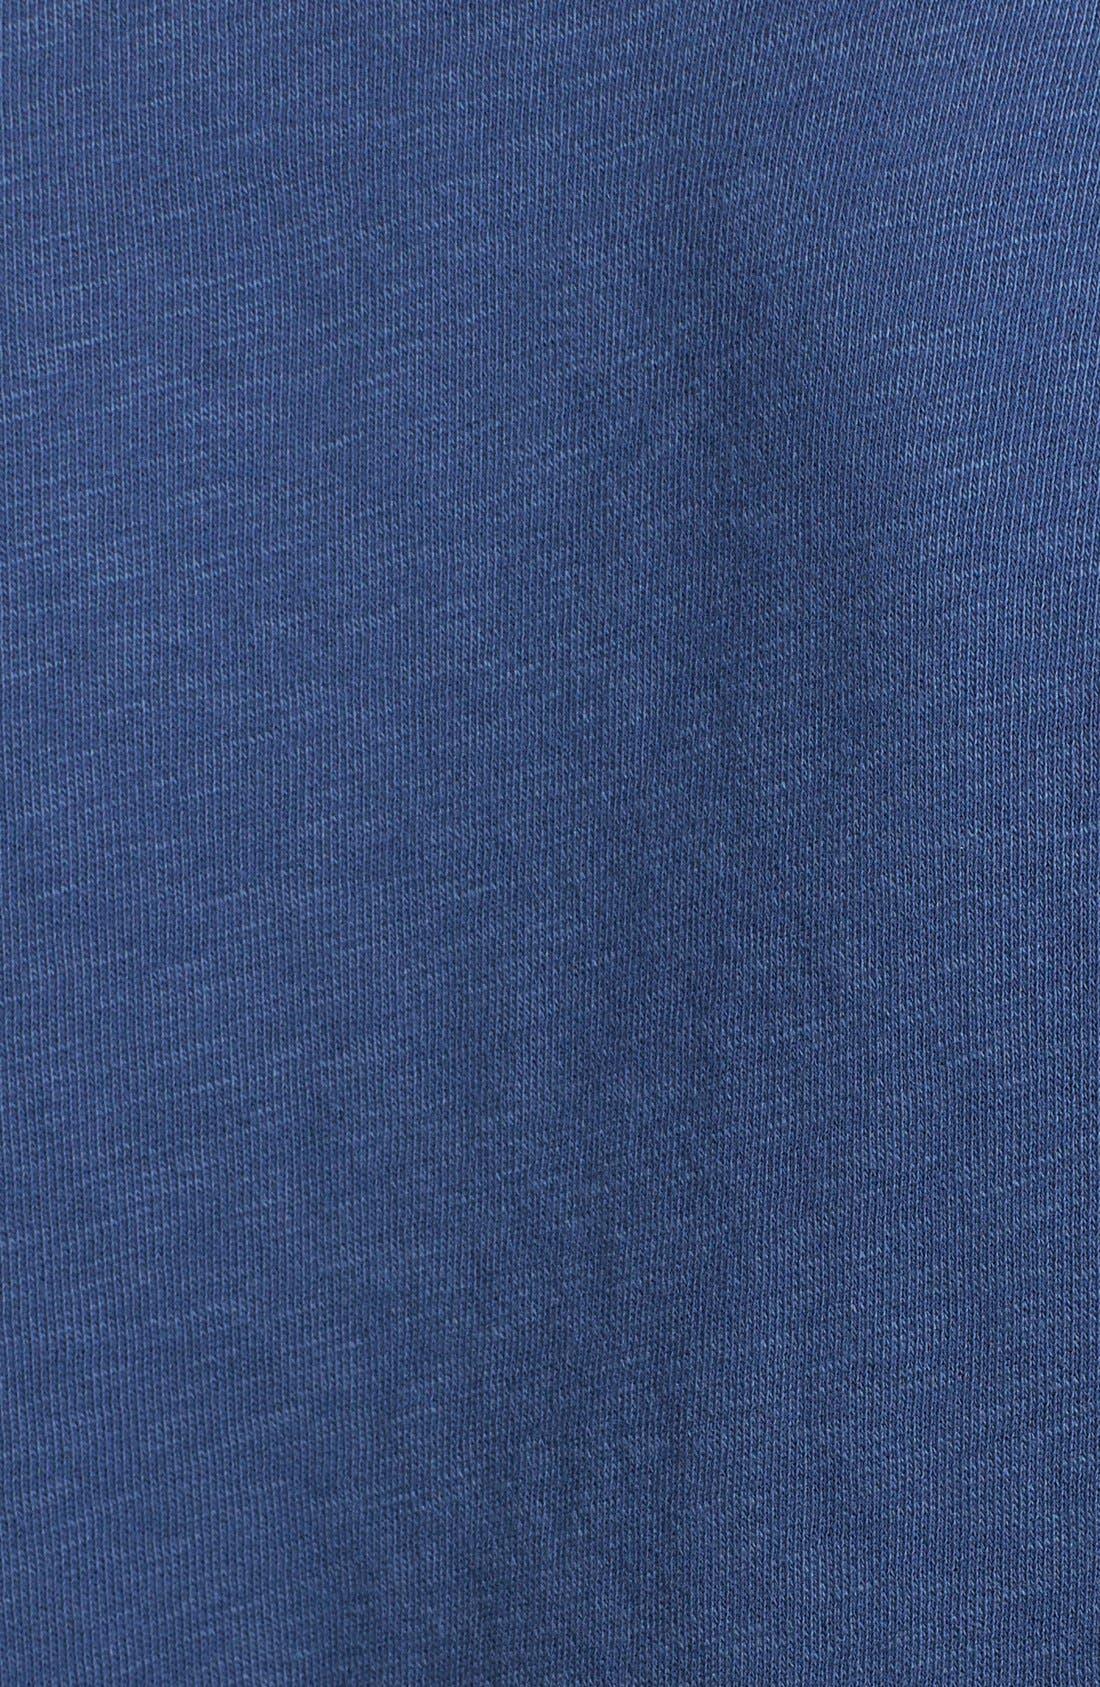 Alternate Image 3  - James Perse 'Vintage' Cotton Raglan Pullover